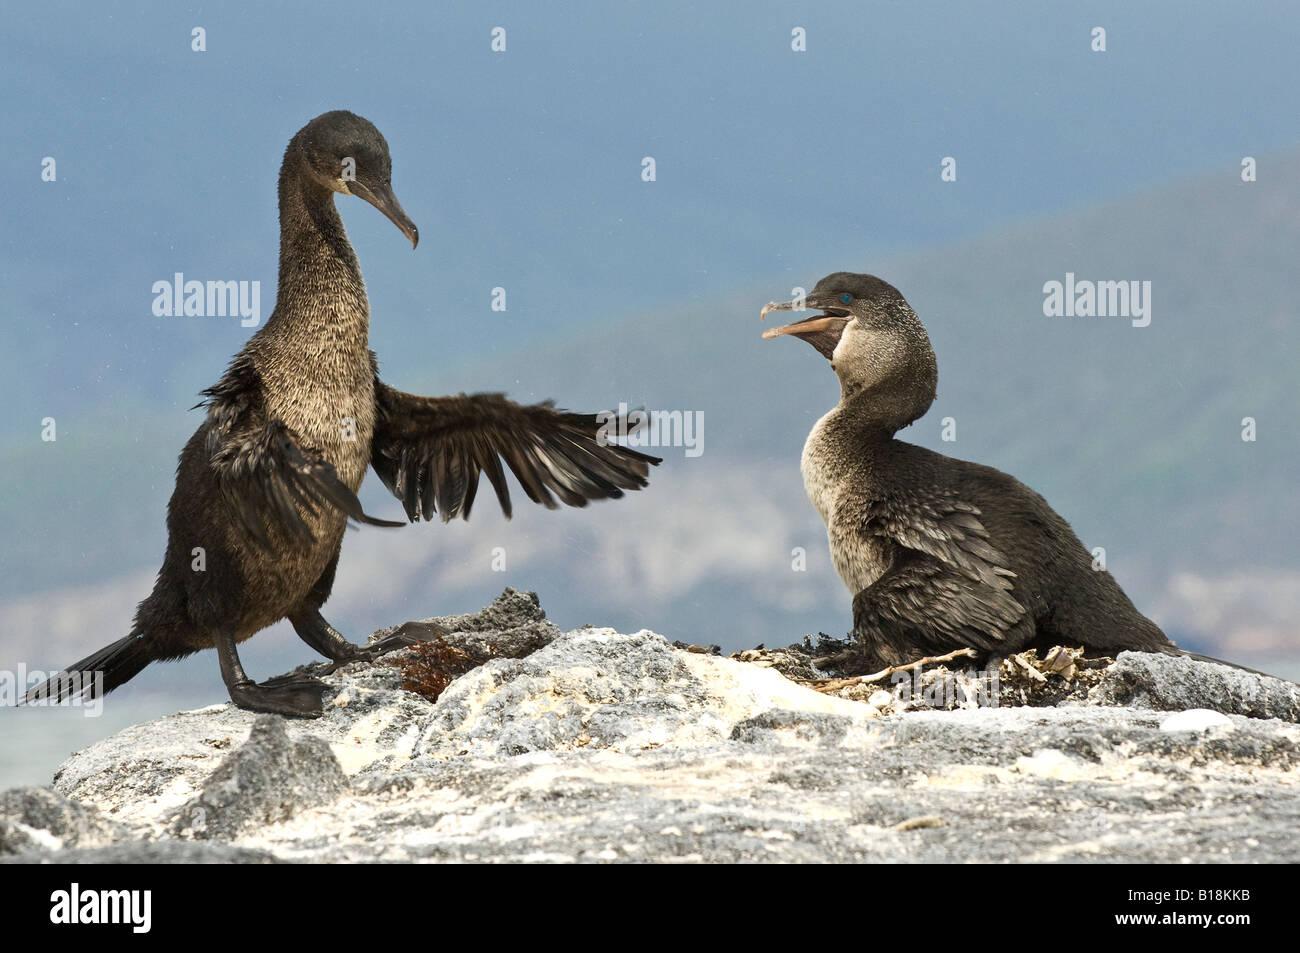 A male Flightless Cormorant returns to the nest, Fernandina island, Galapagos - Stock Image